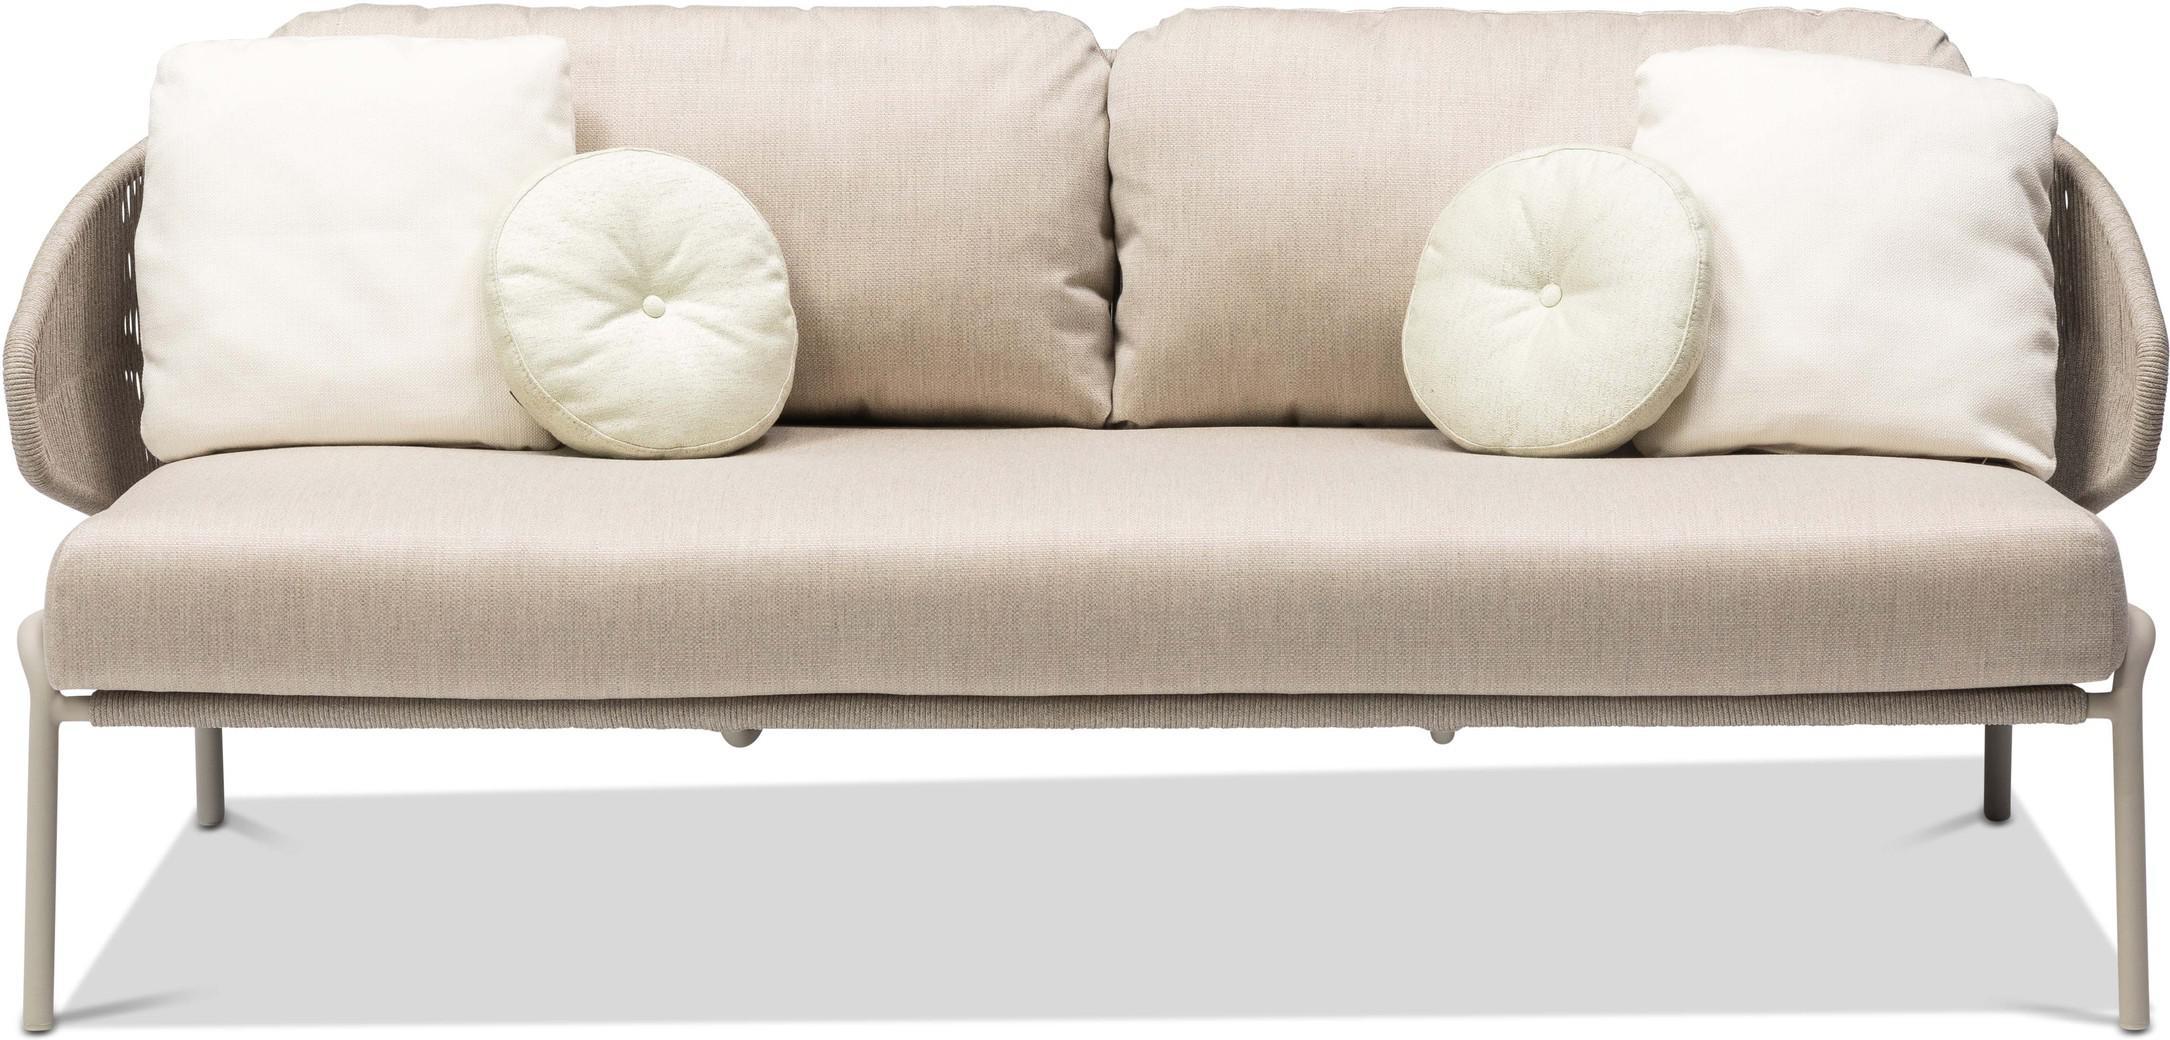 Radius 2,5S - Sofa fixed - flint - pepper